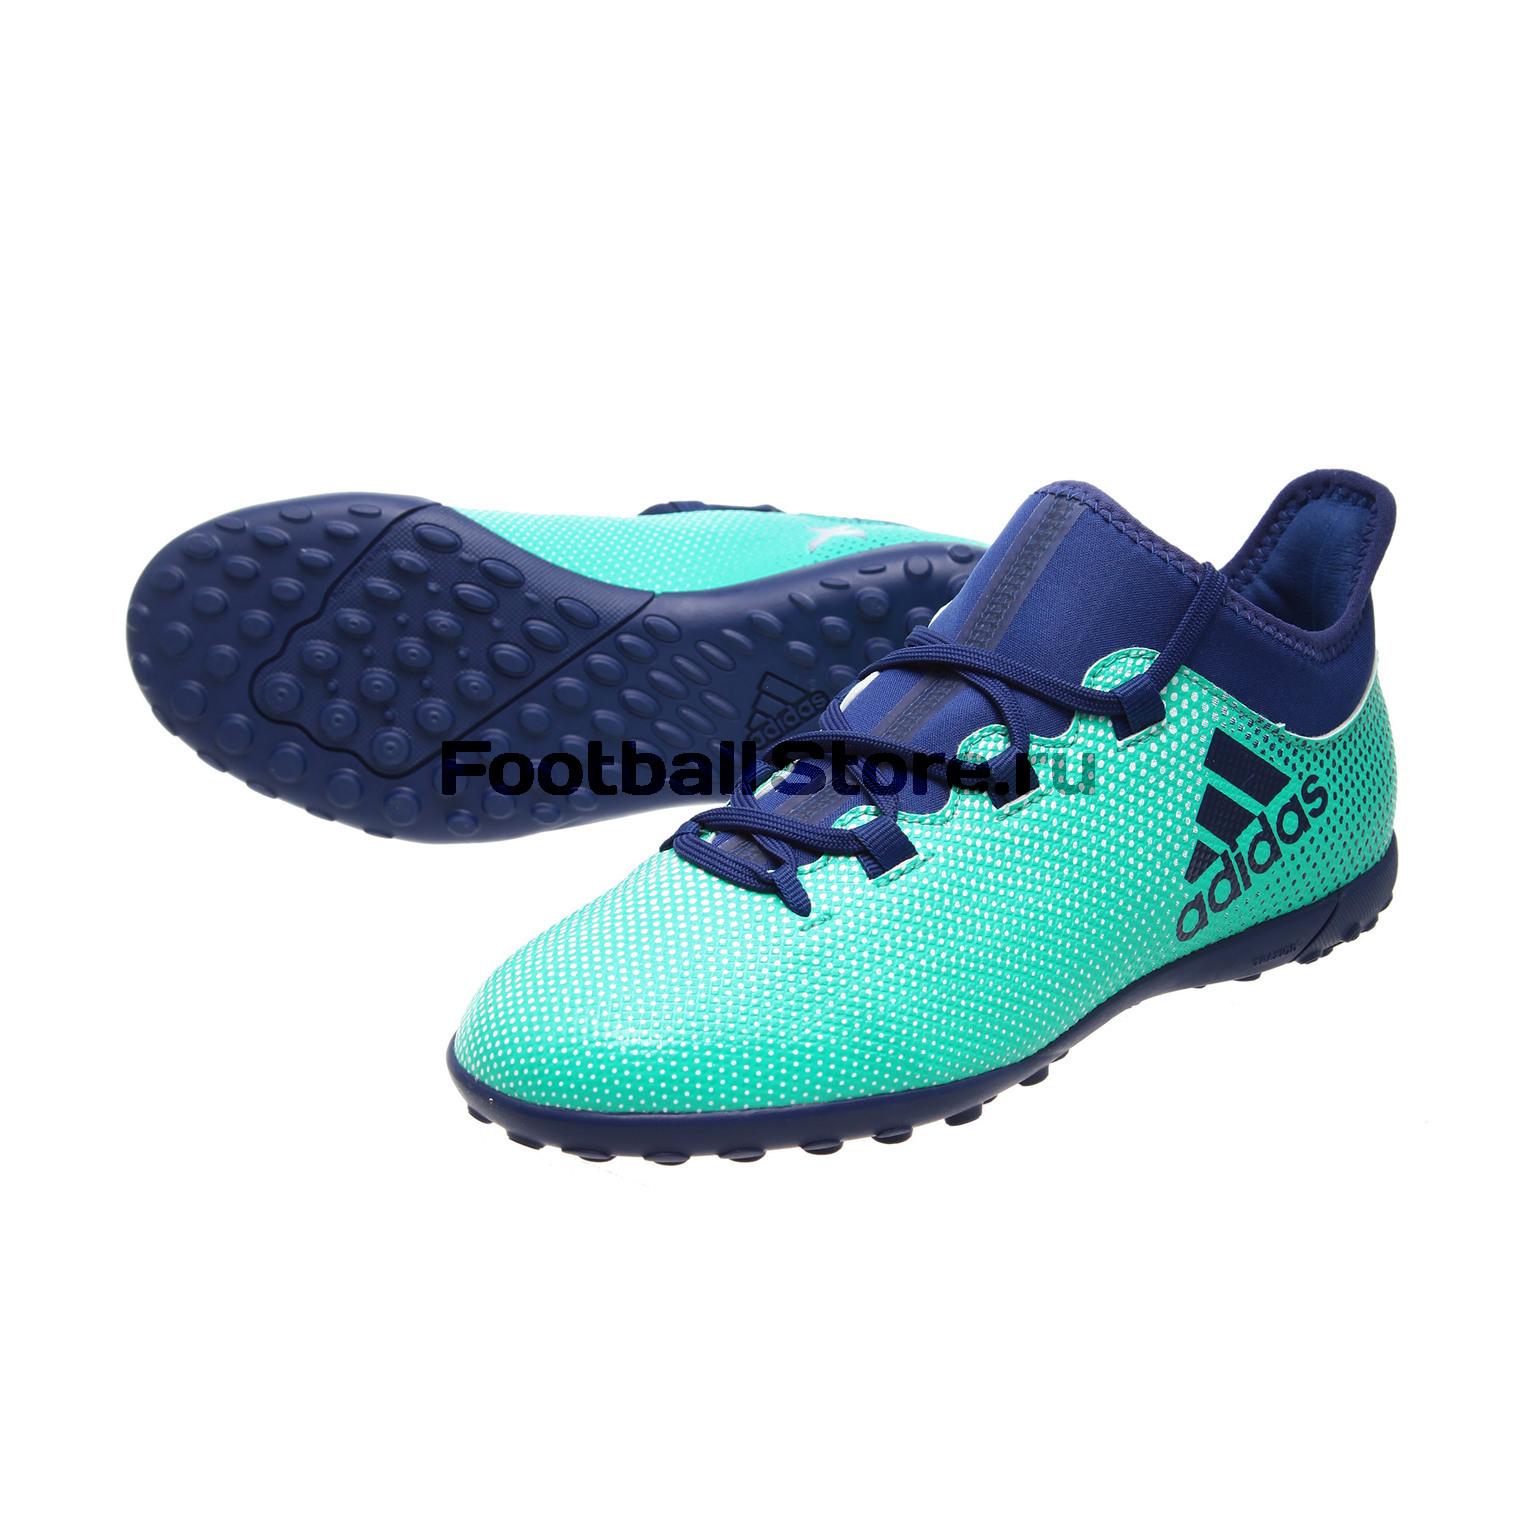 Шиповки Adidas X Tango 17.3 TF JR CP9027 adidas performance tf bra print 1